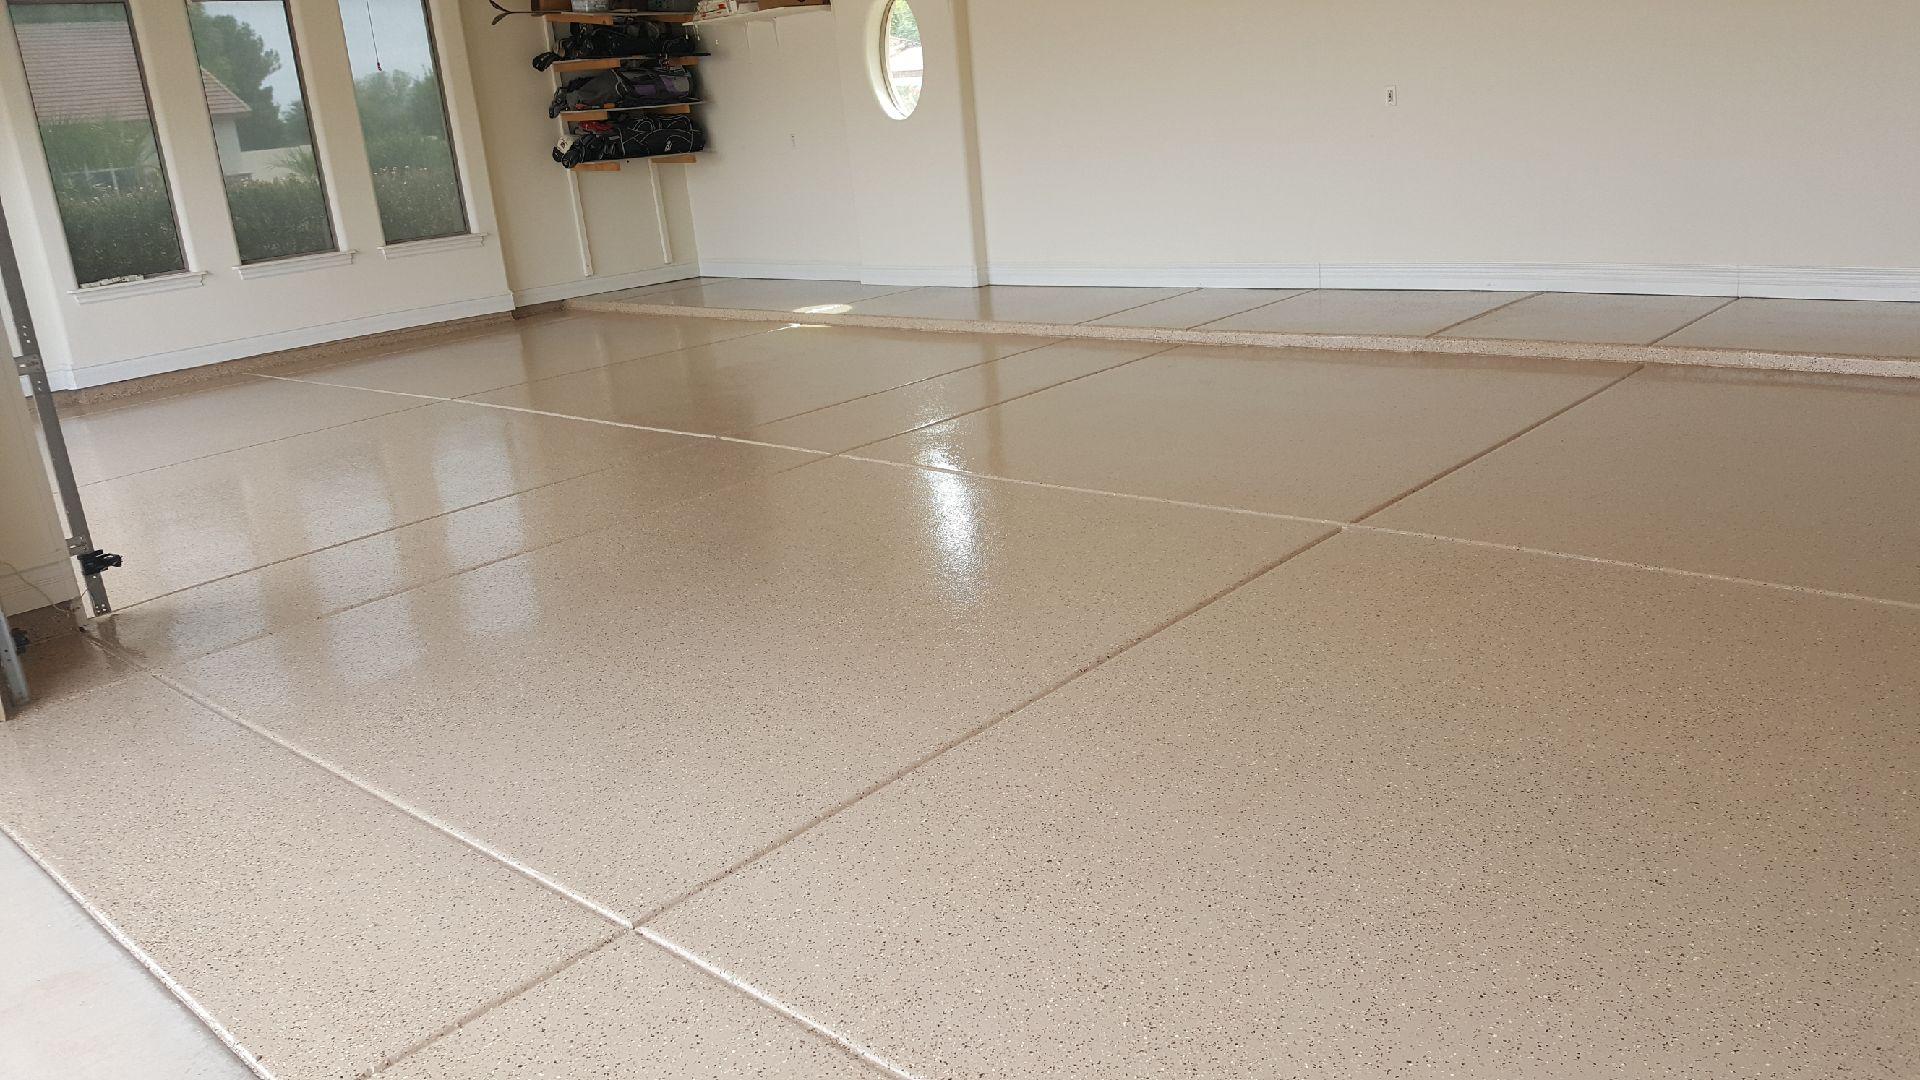 Three Reasons to Choose Epoxy Coated Concrete Flooring